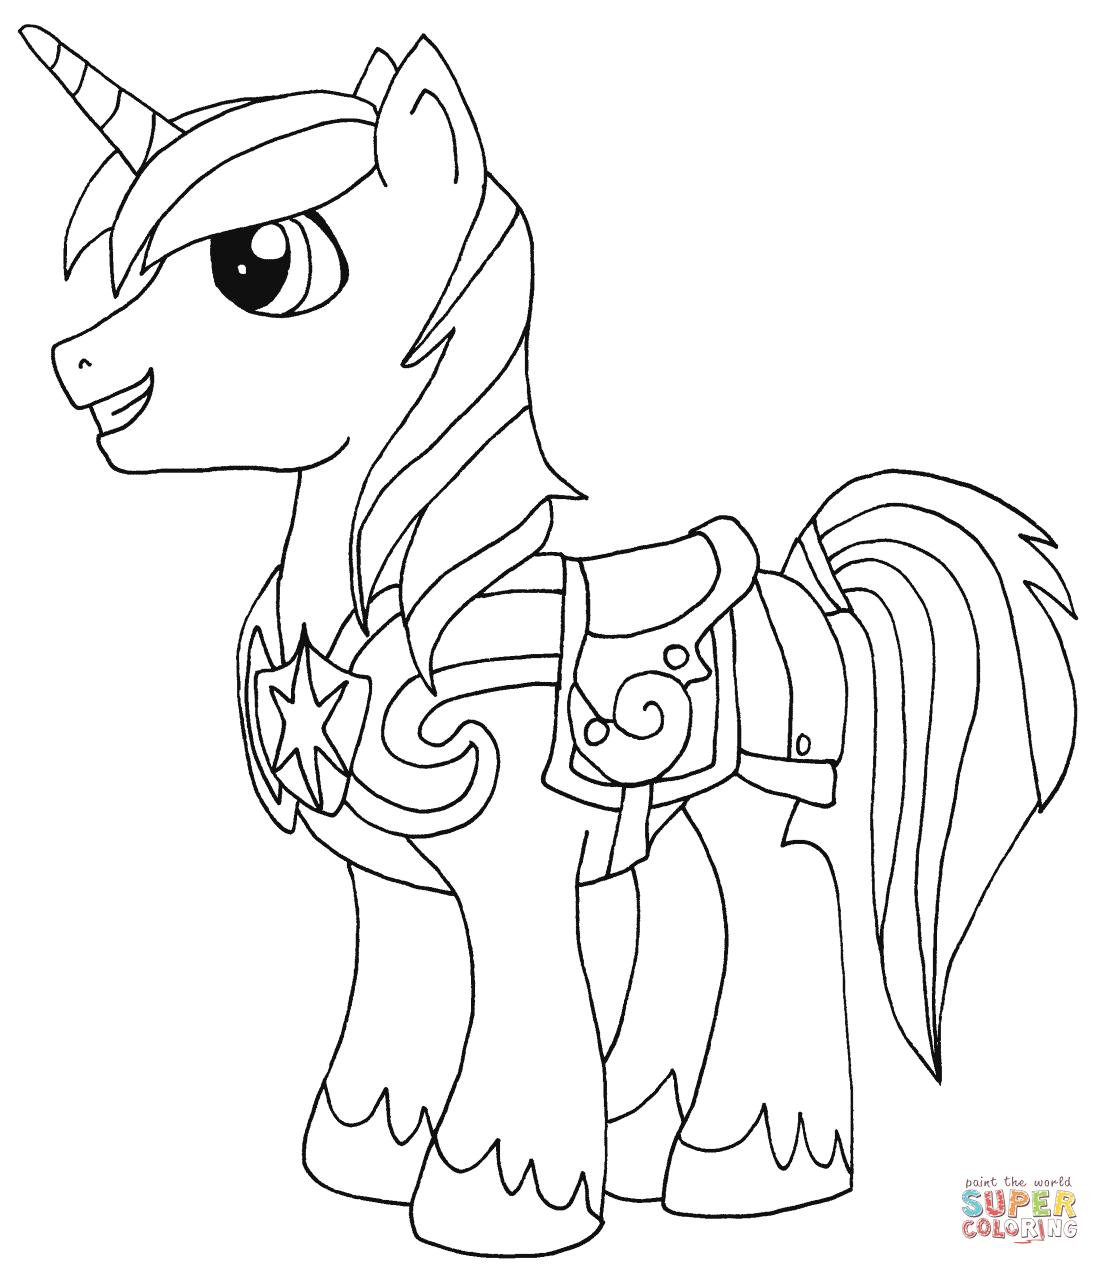 Shining armor rarity pony from my little pony